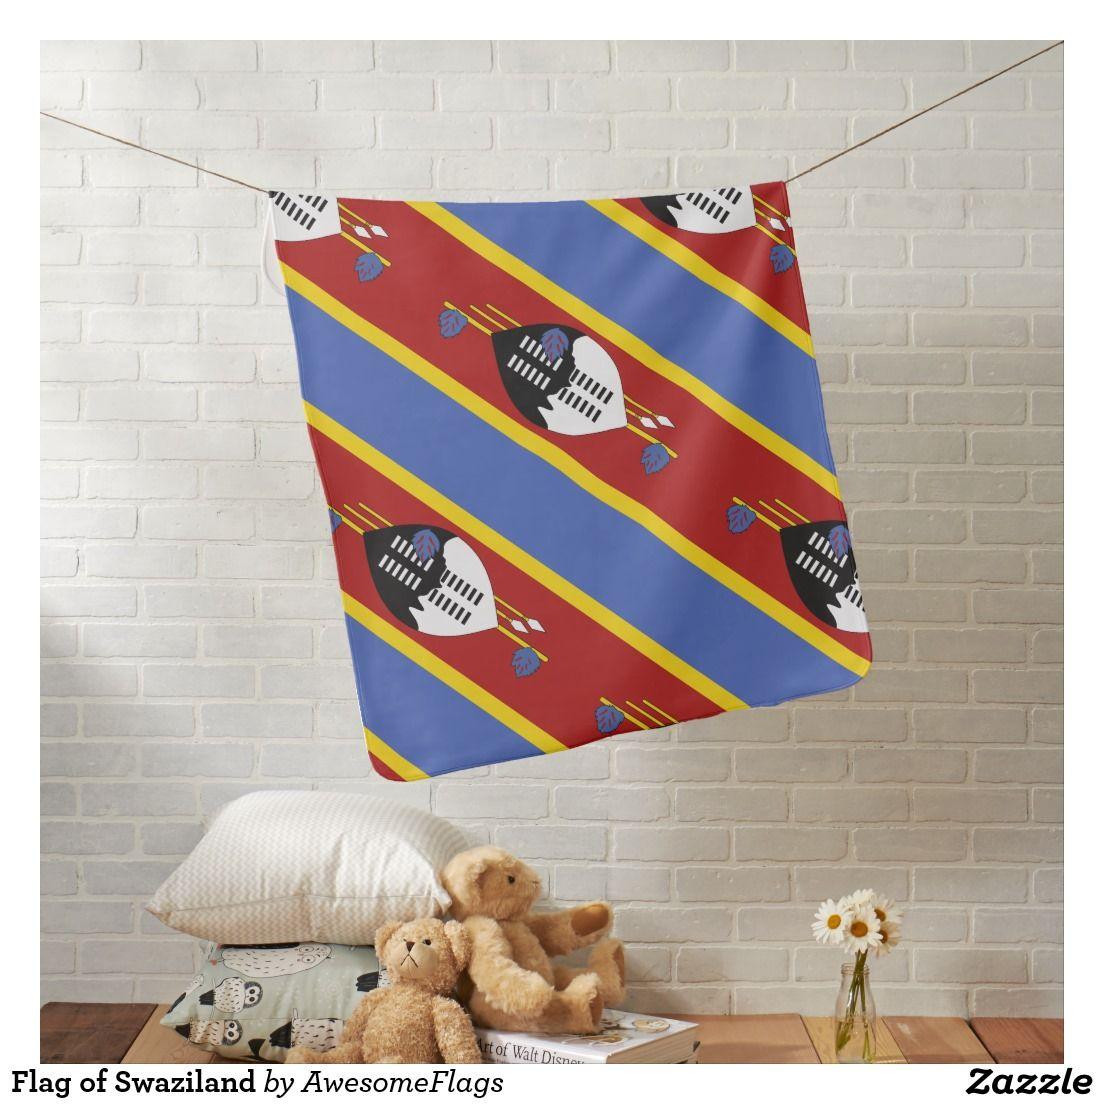 Flag of Swaziland Pramblanket